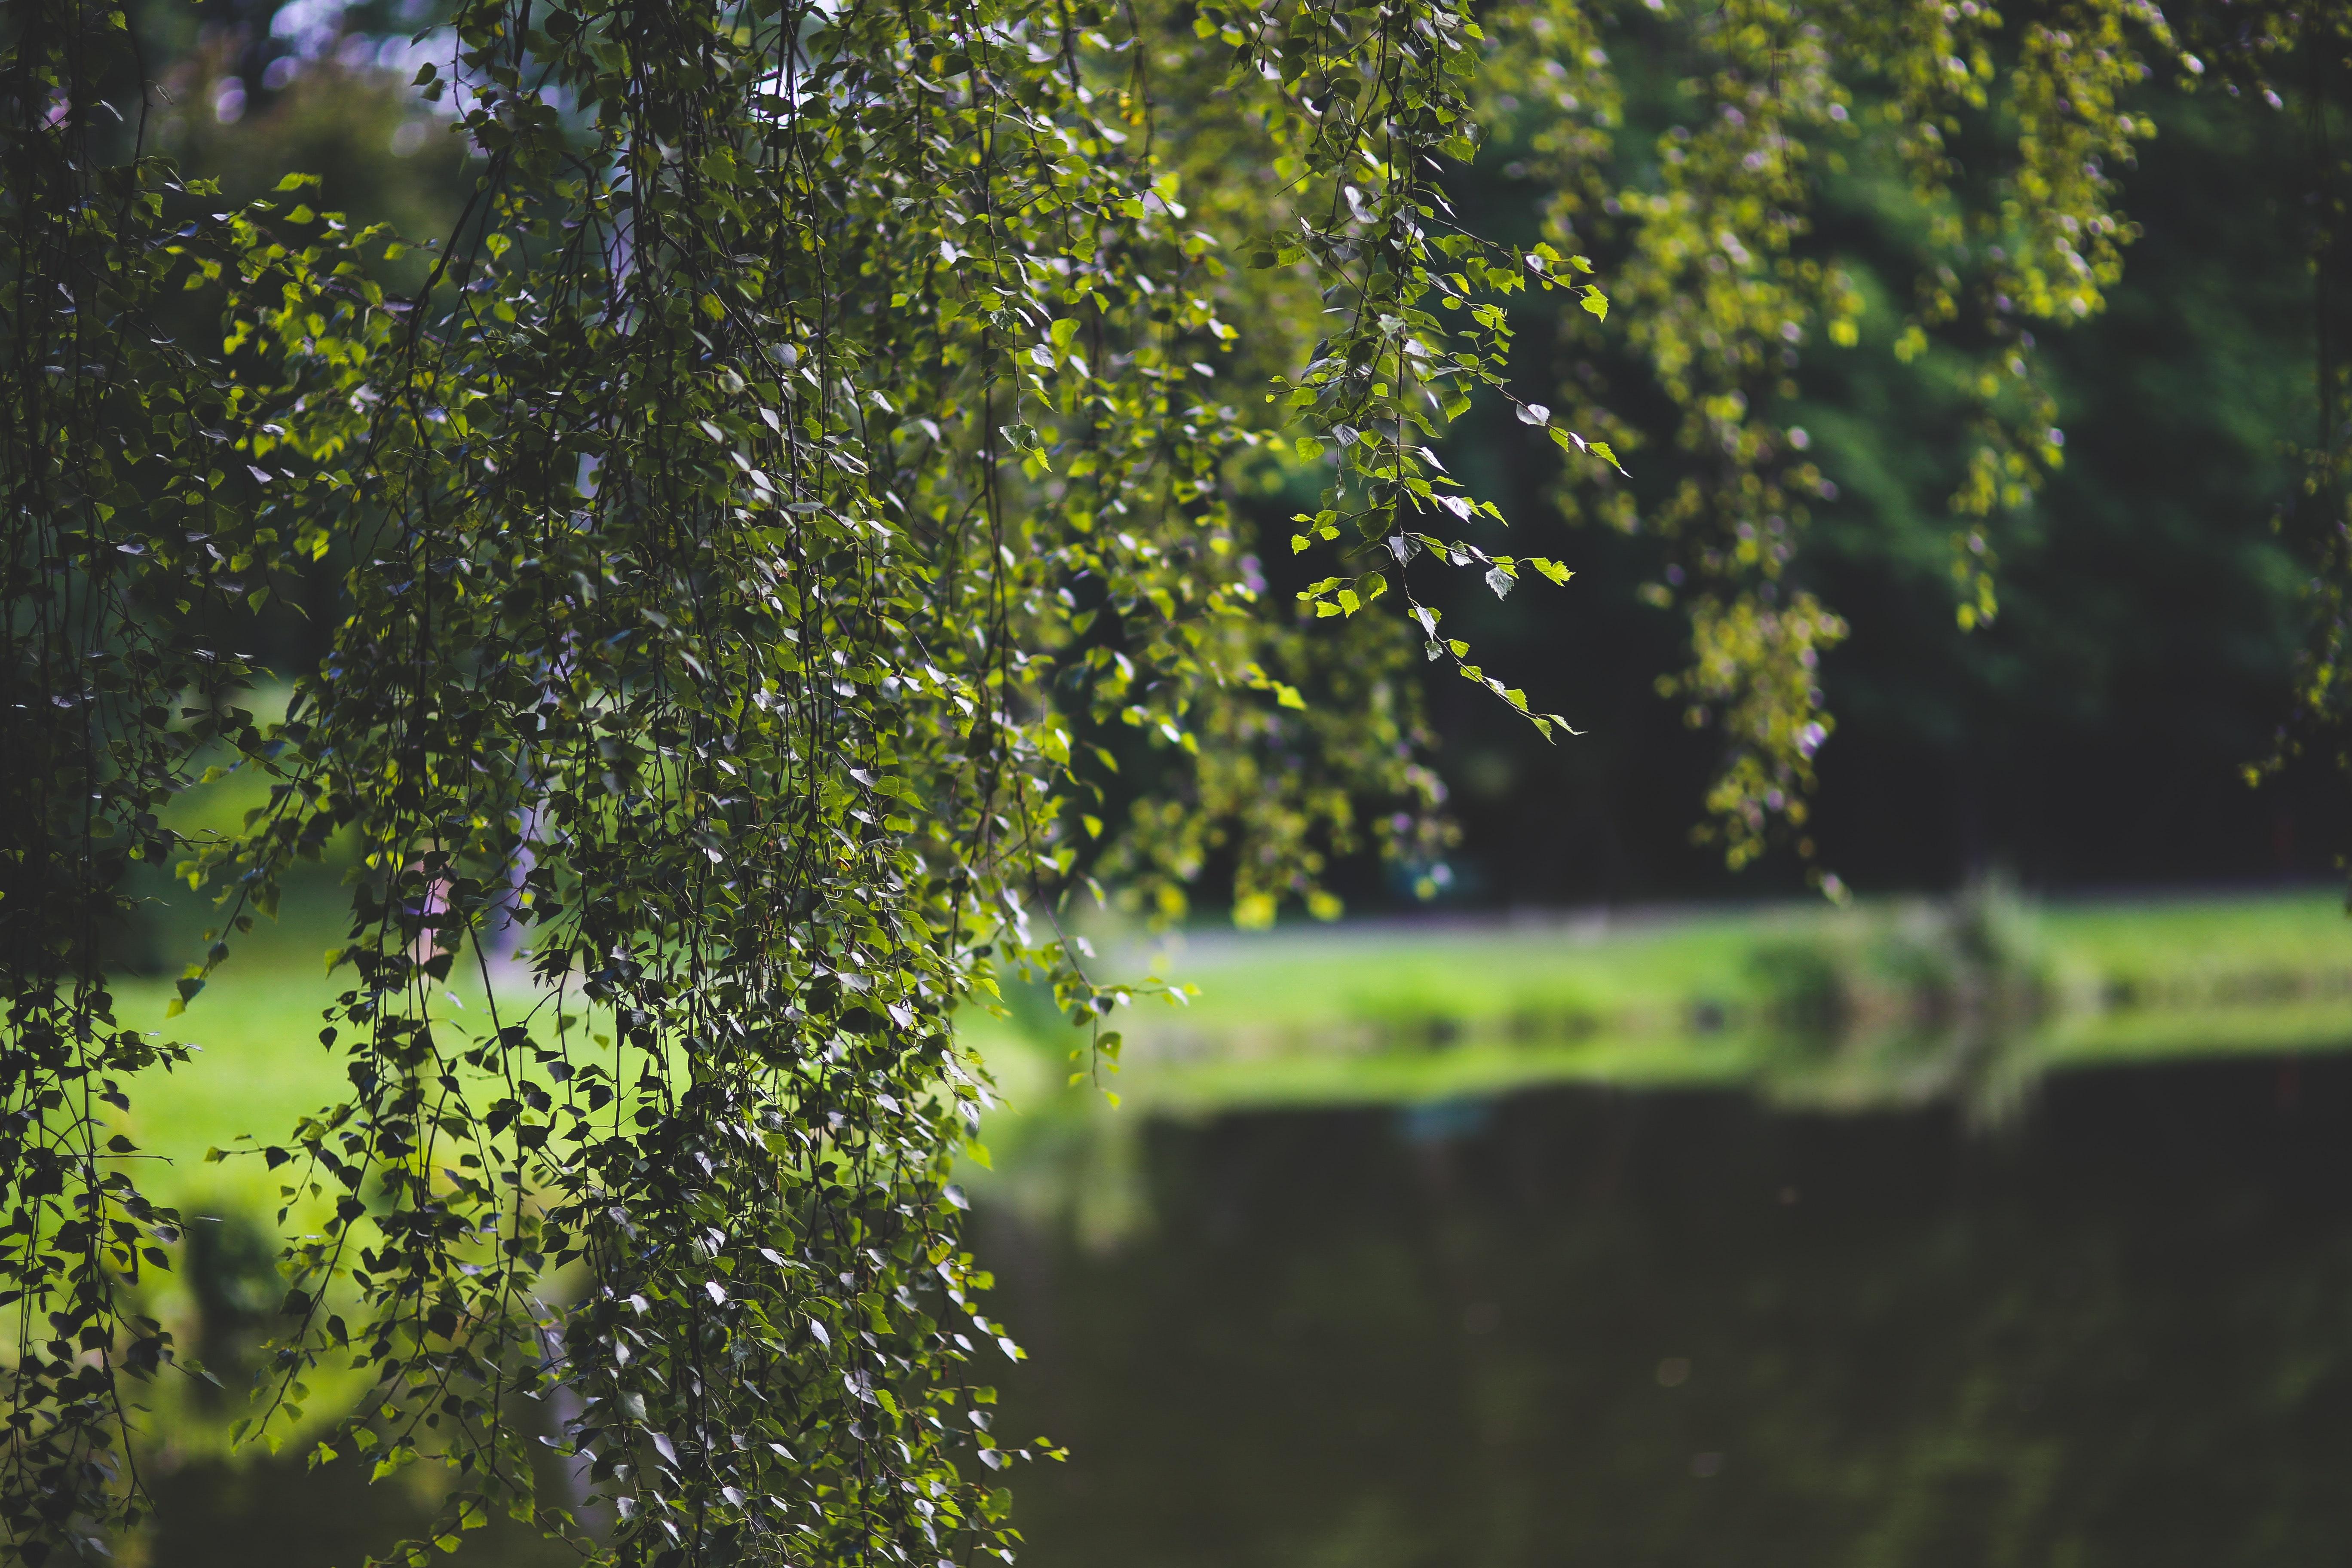 Birch-tree photo